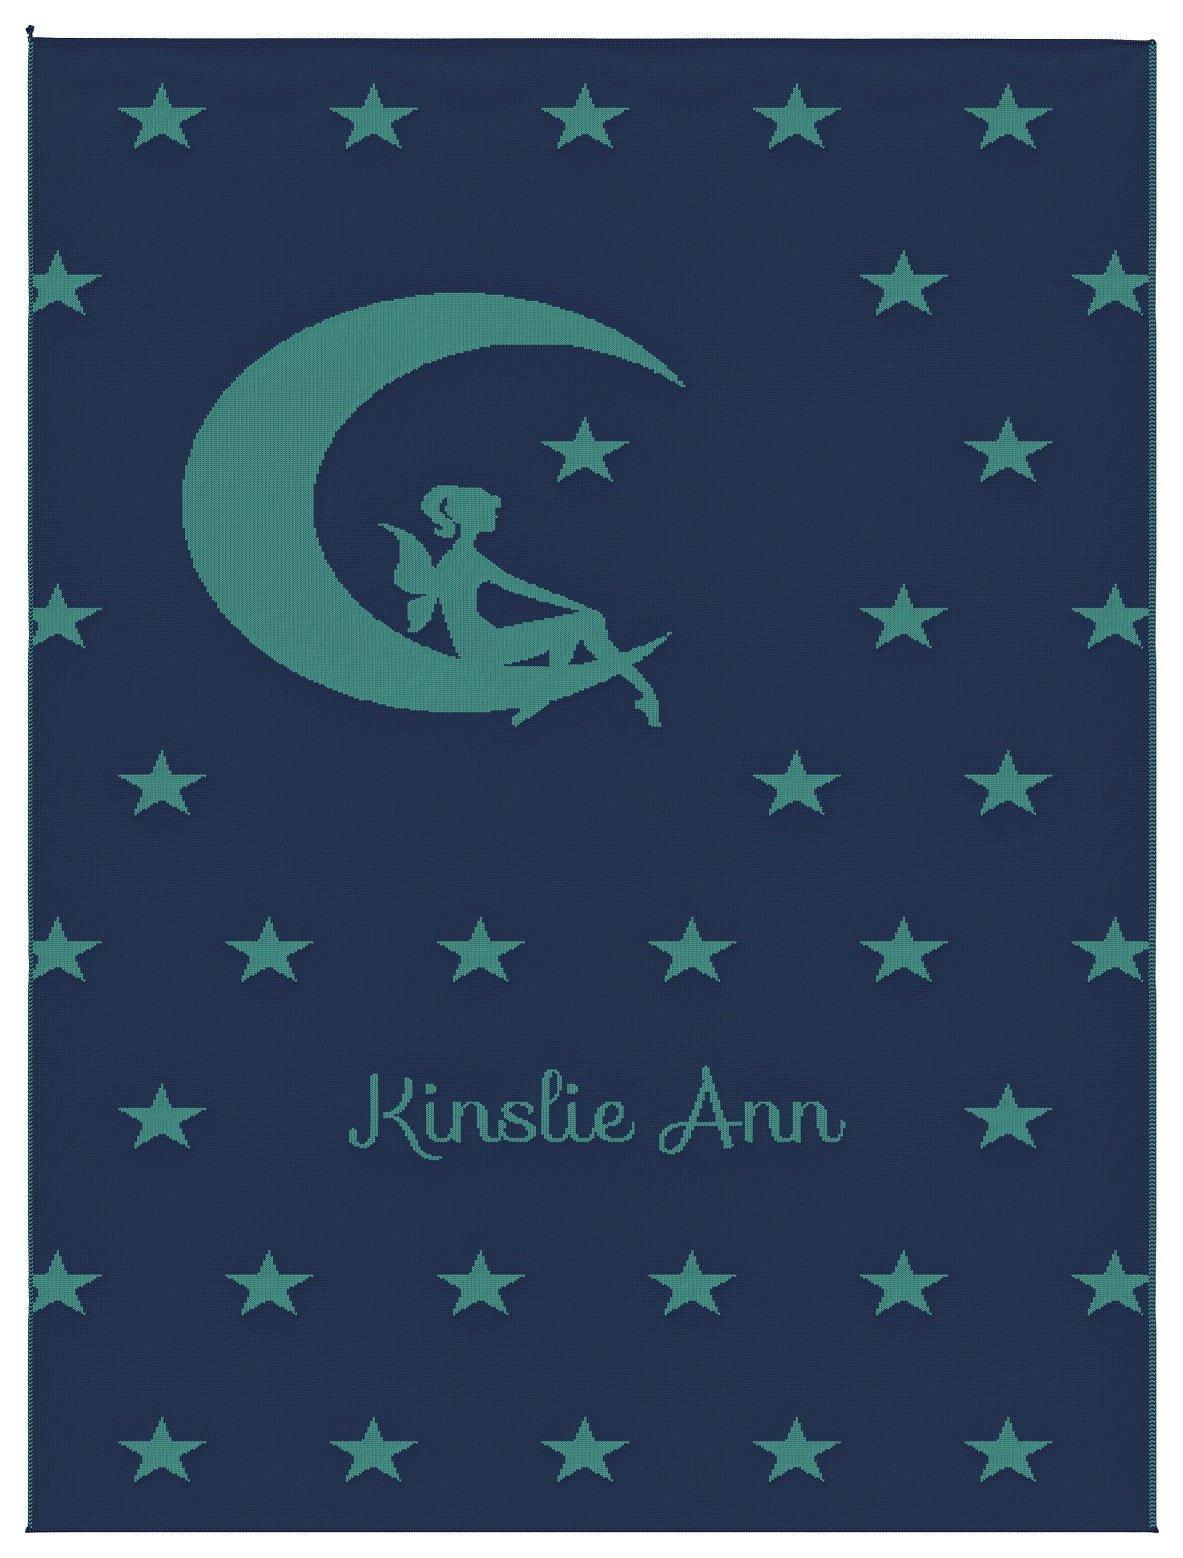 Emji Luxury Knit Baby Blanket with Fairy Stars, Customized Girl's Name Stroller Blanket, 100% Cashwool Merino Wool, Blue and Sea Green by Emji